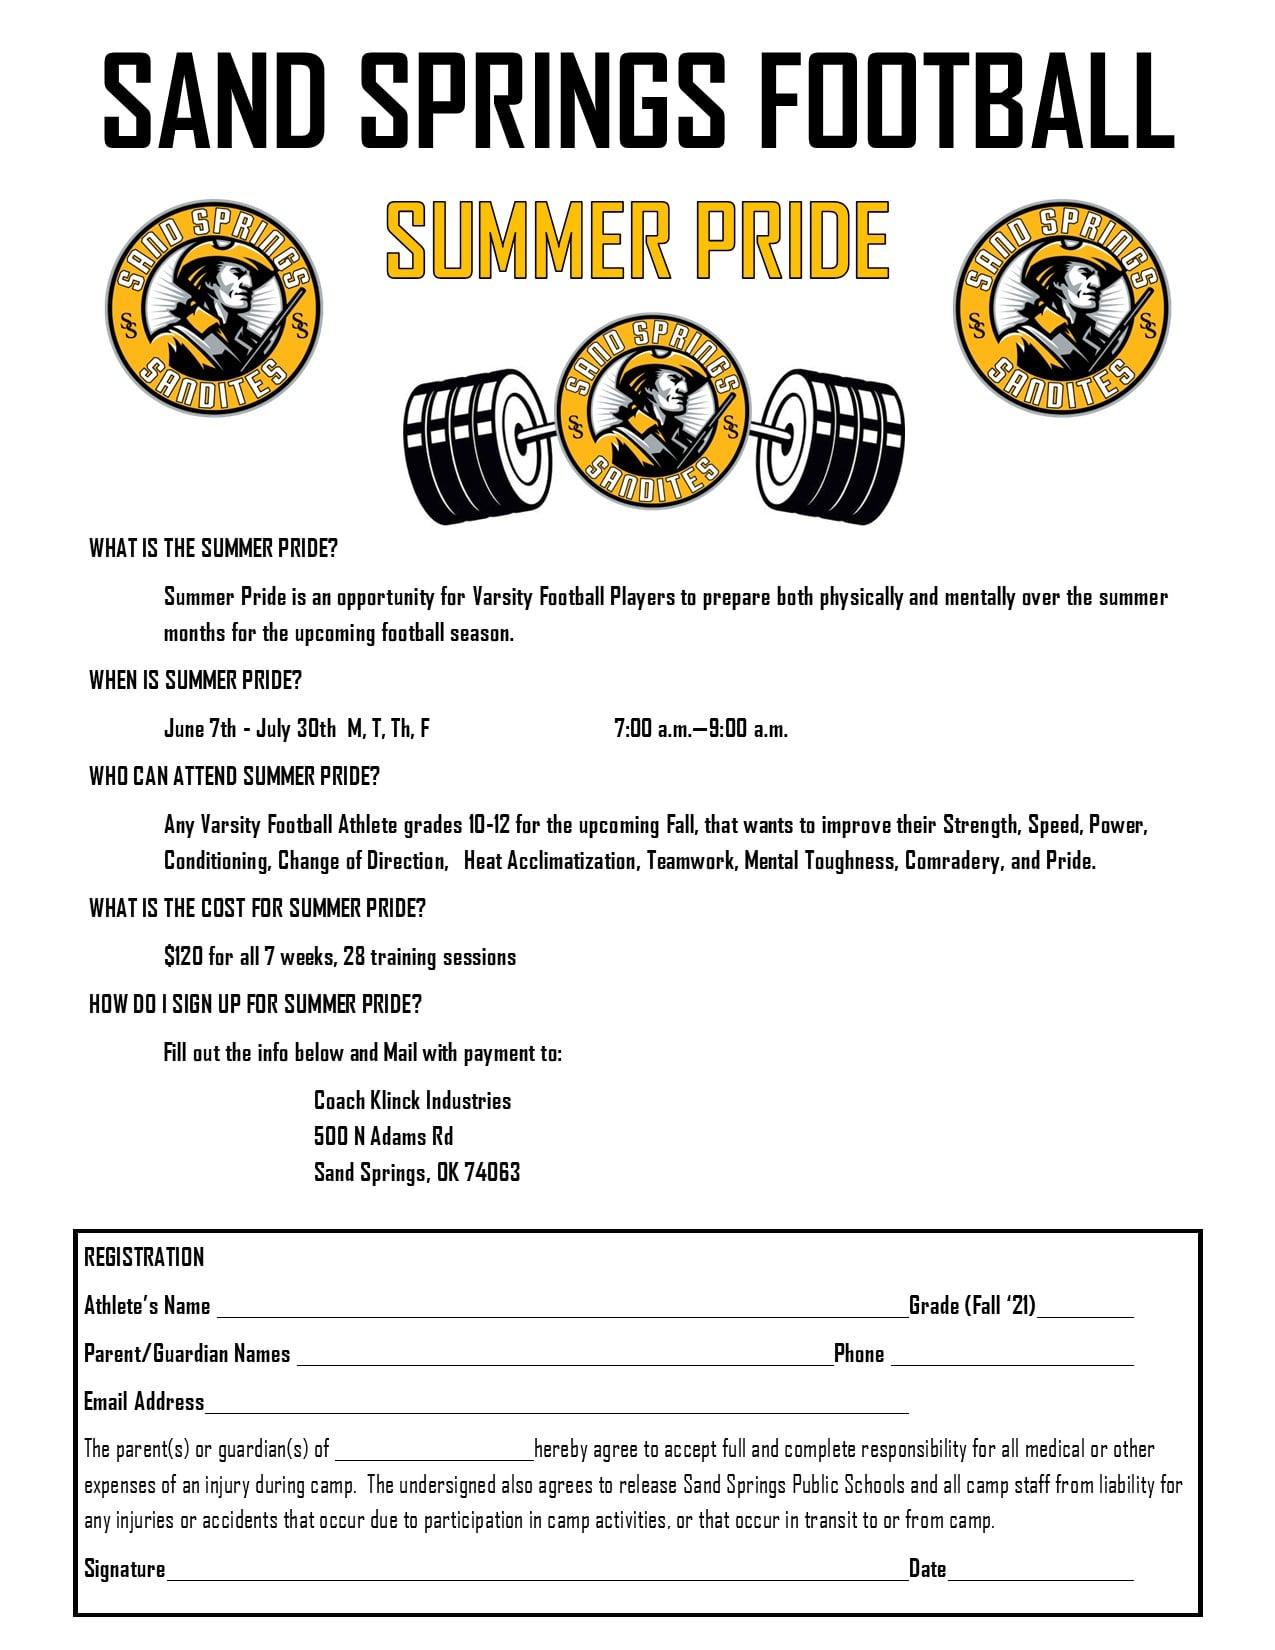 SSPS Summer Pride